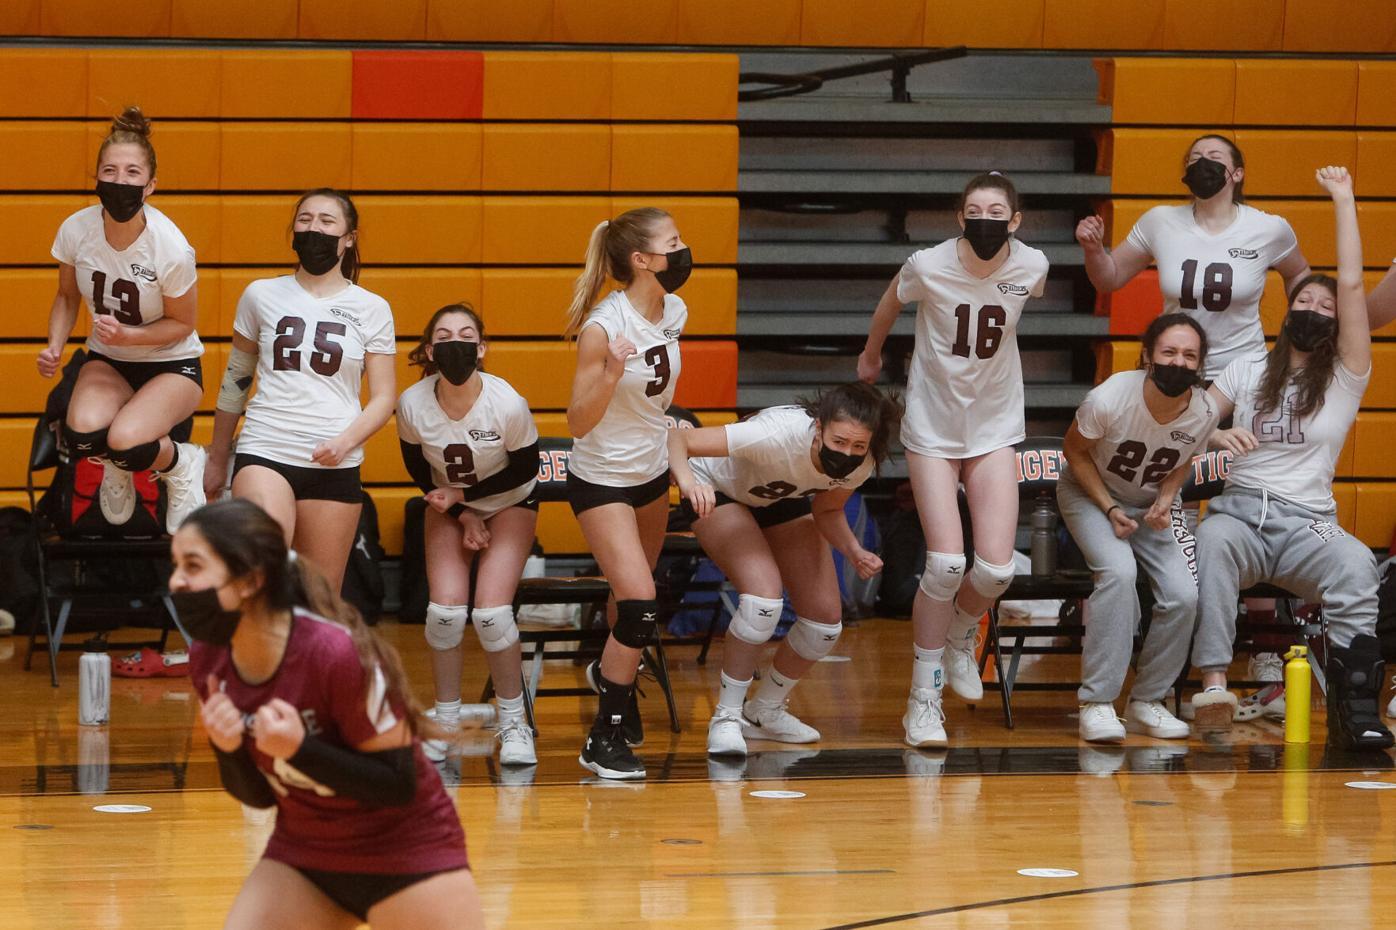 Sc girls volleyball